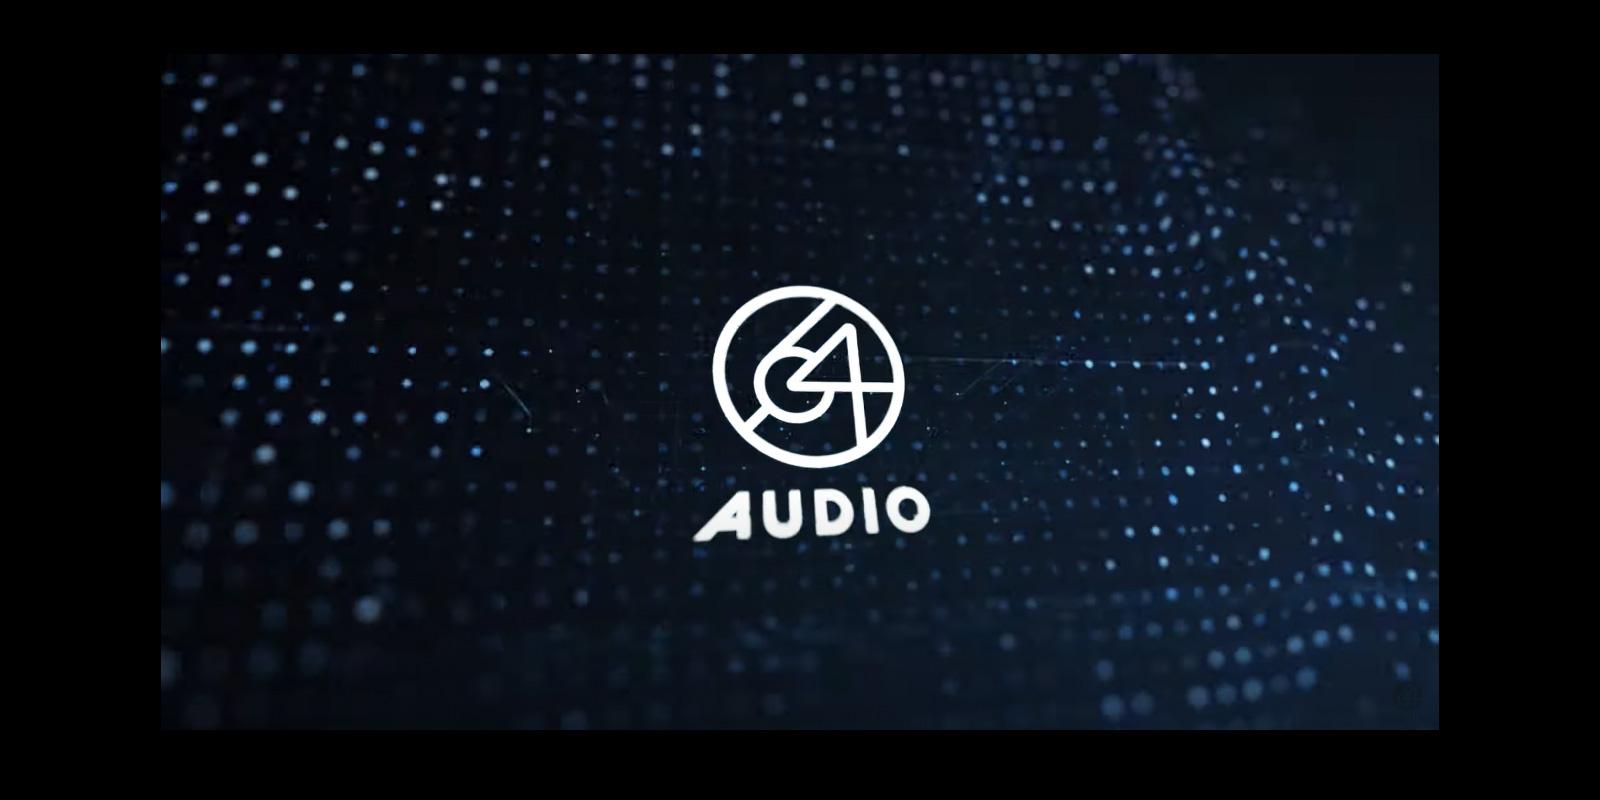 64 Audio Winter 2021 Livestream Event